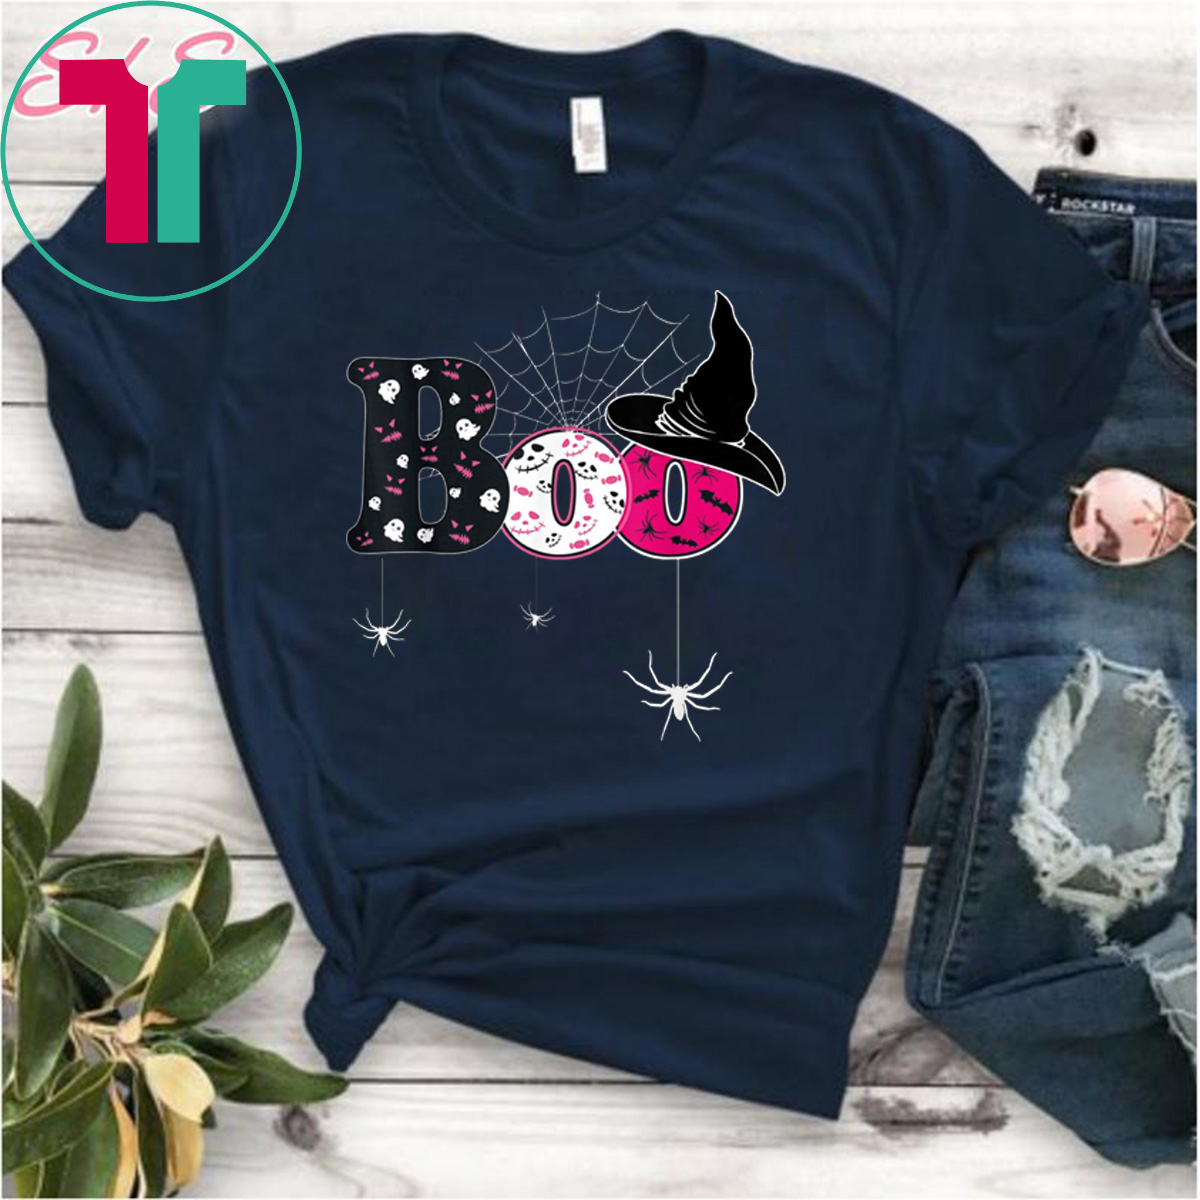 new style b1865 d0042 Boo Halloween Costume Shirt Bat Ghost Pumkin Hat Spider Top T-Shirt -  Reviewshirts Office